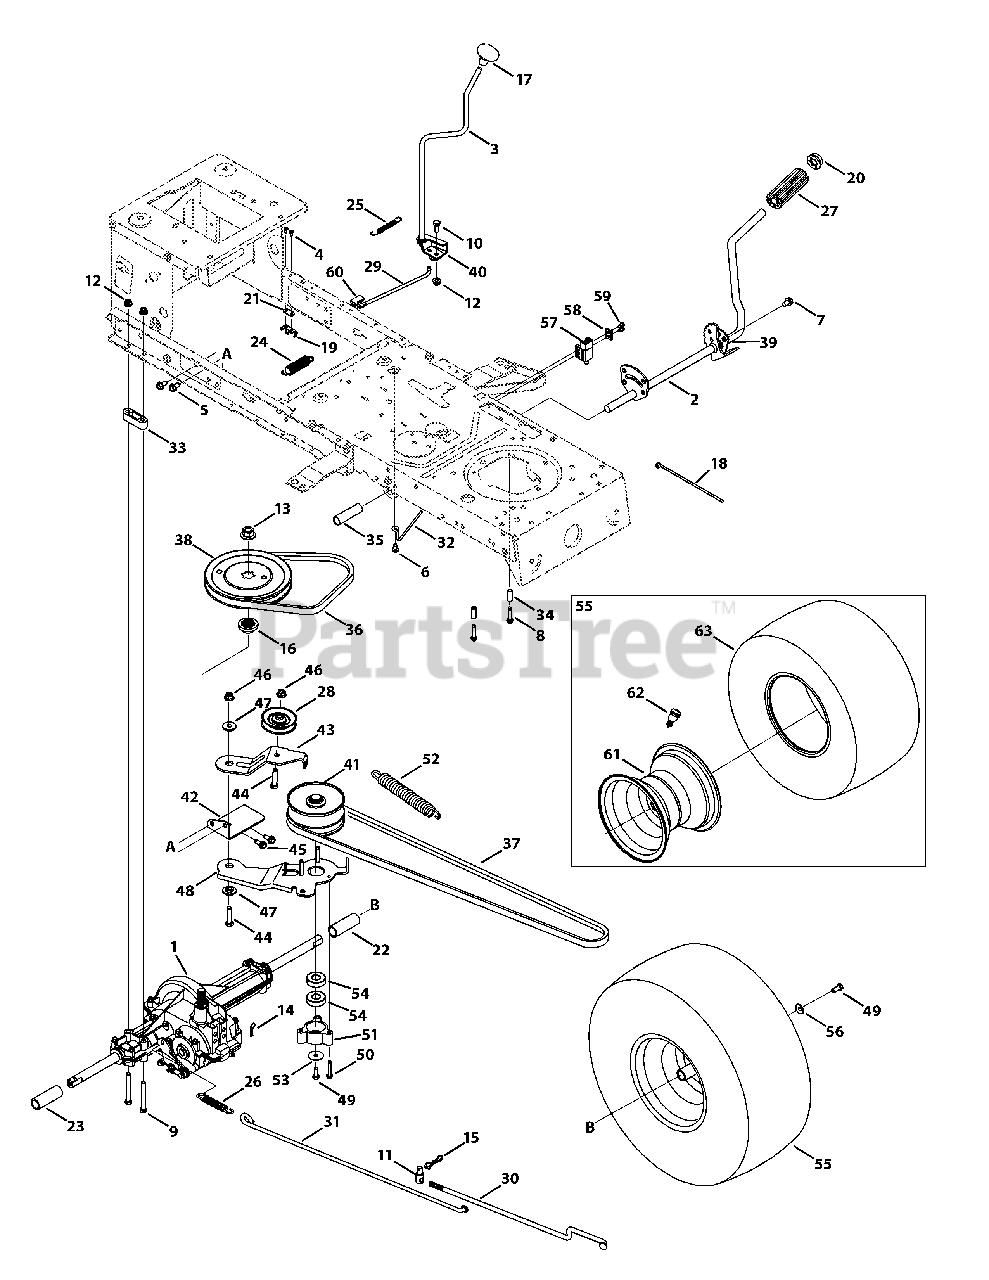 MTD Genuine Parts 42 inch Deck Drive Belt OEM-754-04060